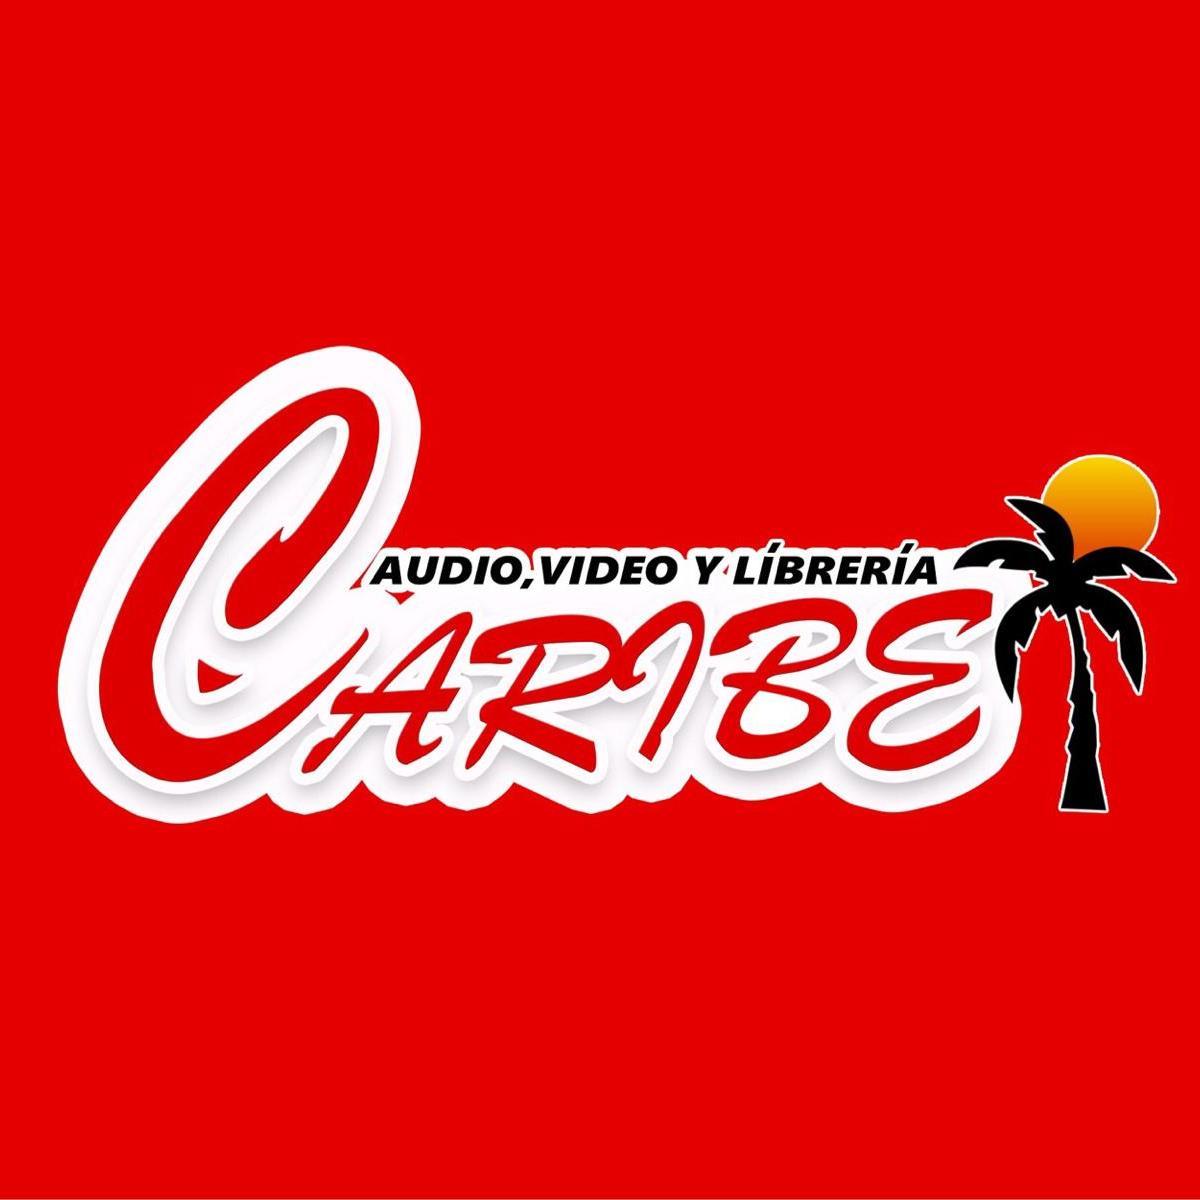 Libreria Caribe